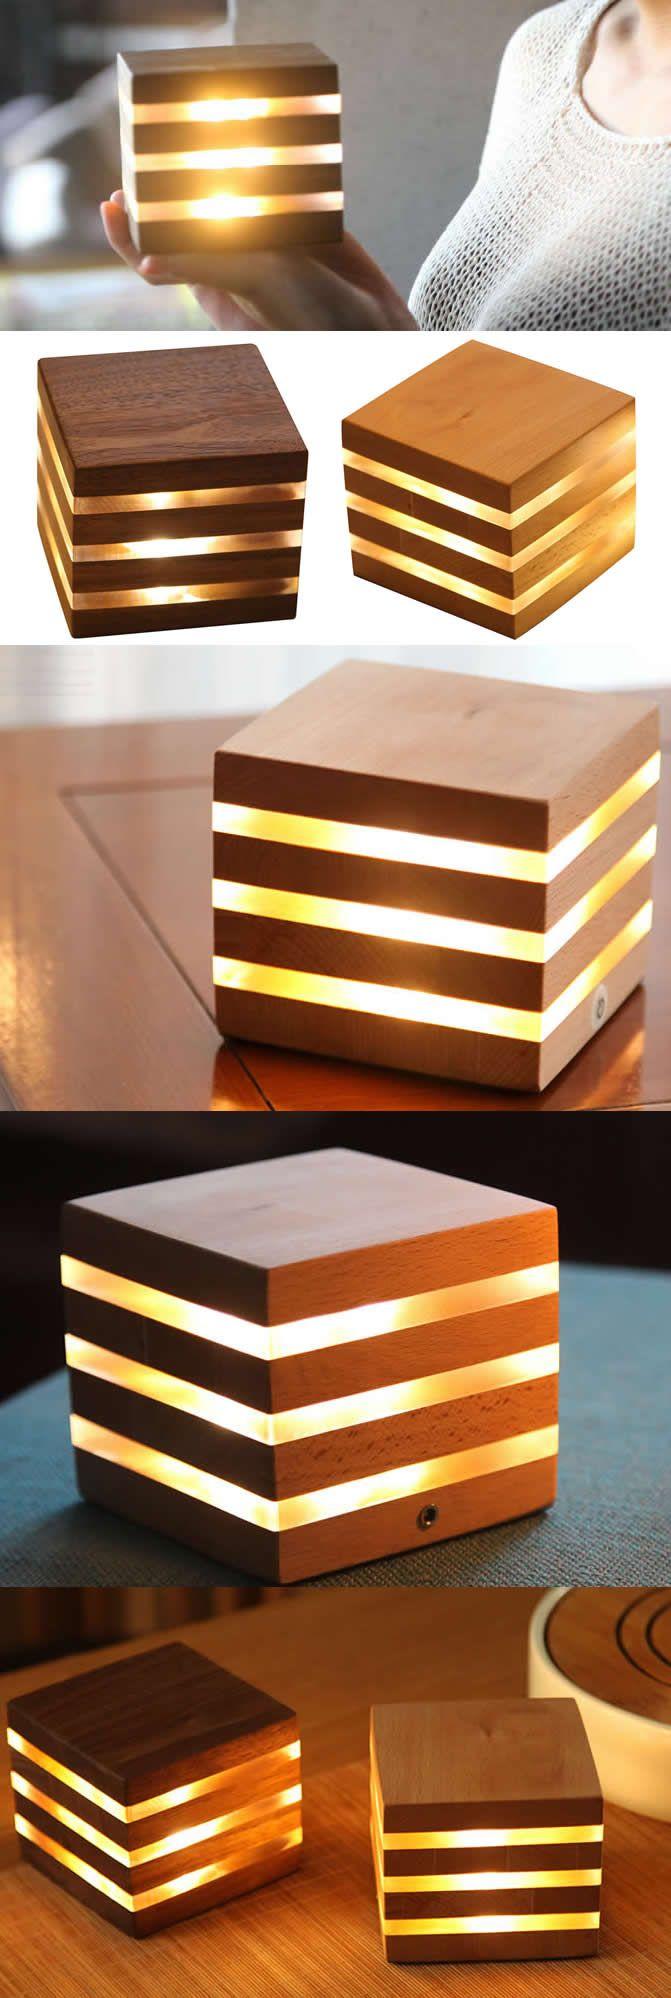 Bamboo Wooden Cube Led Night Light Lamp Desk Art Deco Style Bamboo Wood Cube Led Lamp Night Light Made From Cube Table Lamp Wooden Cubes Wooden Lamps Design